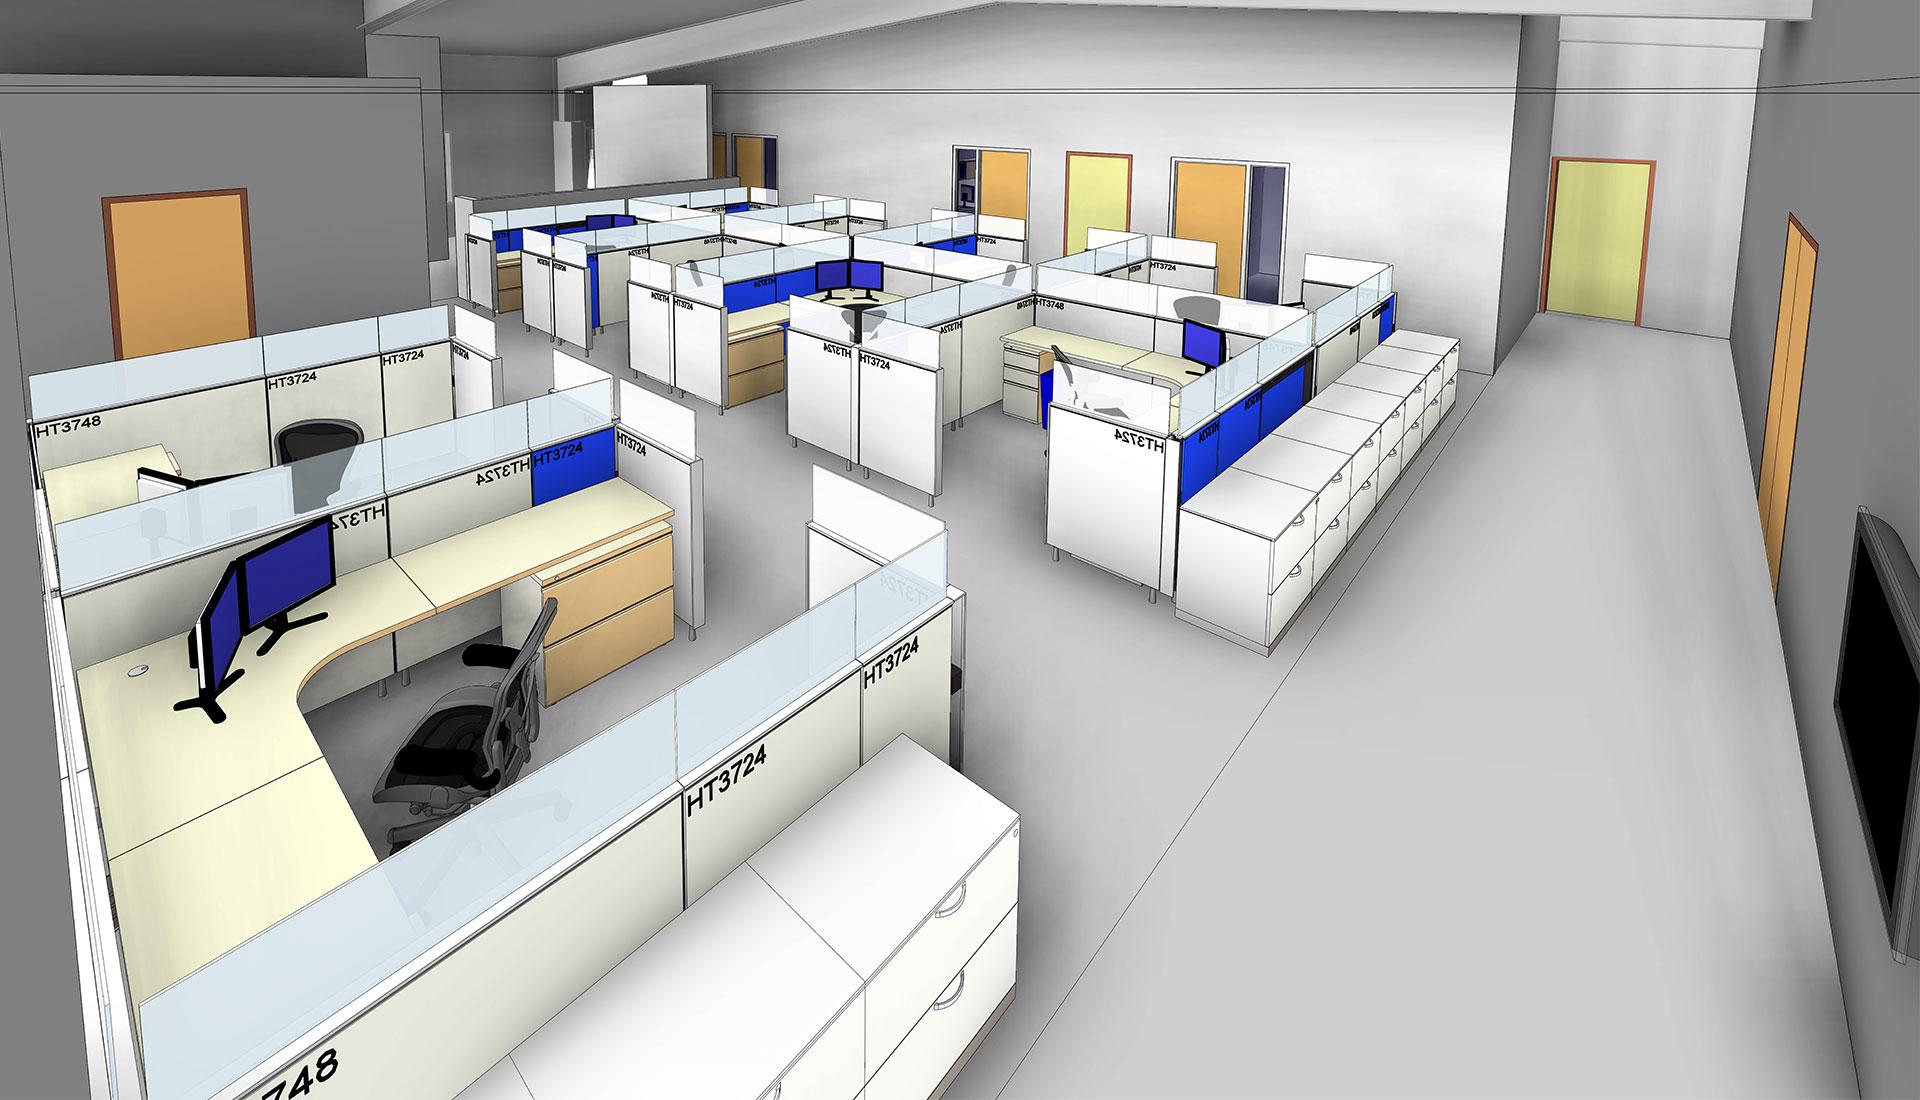 Sitting-Arrangement-3D-Revit_Architectural-Model_Industrial-Project_BIM-Modeling-by-United-BIM